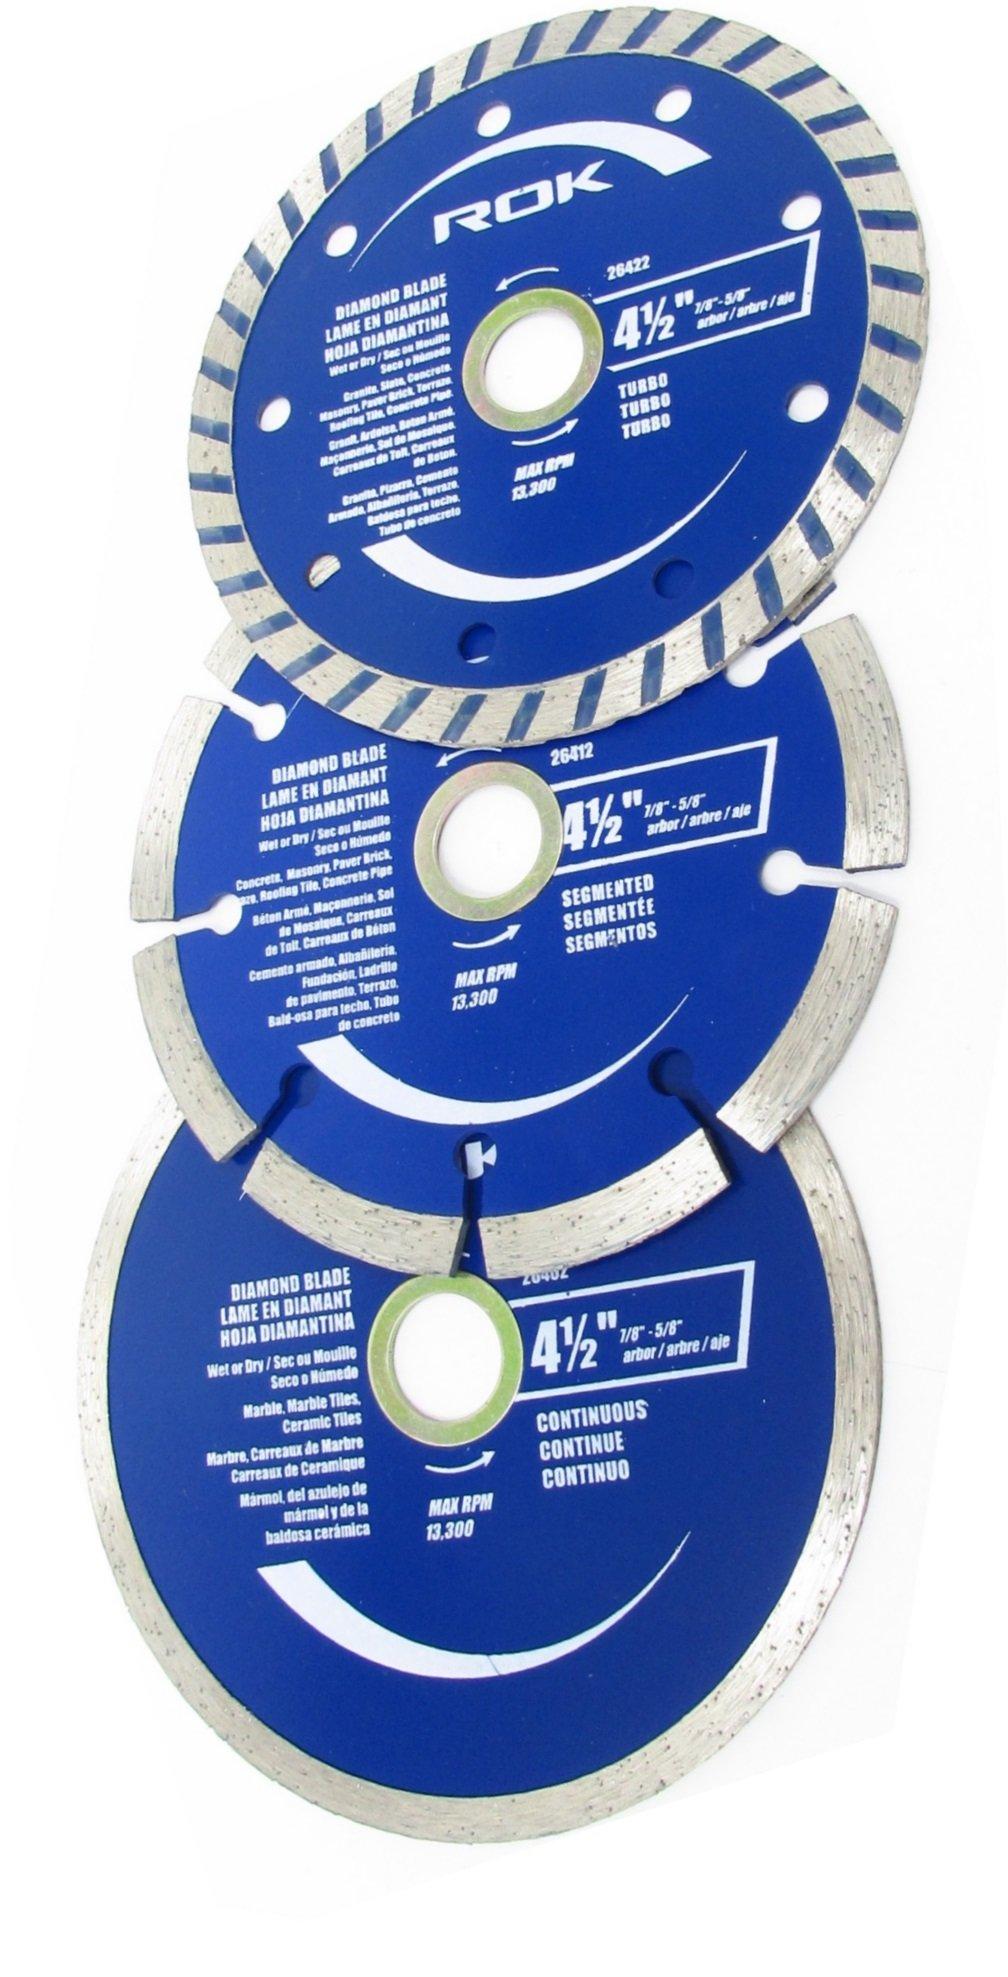 ROK 4-1/2 inch Diamond Saw Blade Set for Angle Grinders